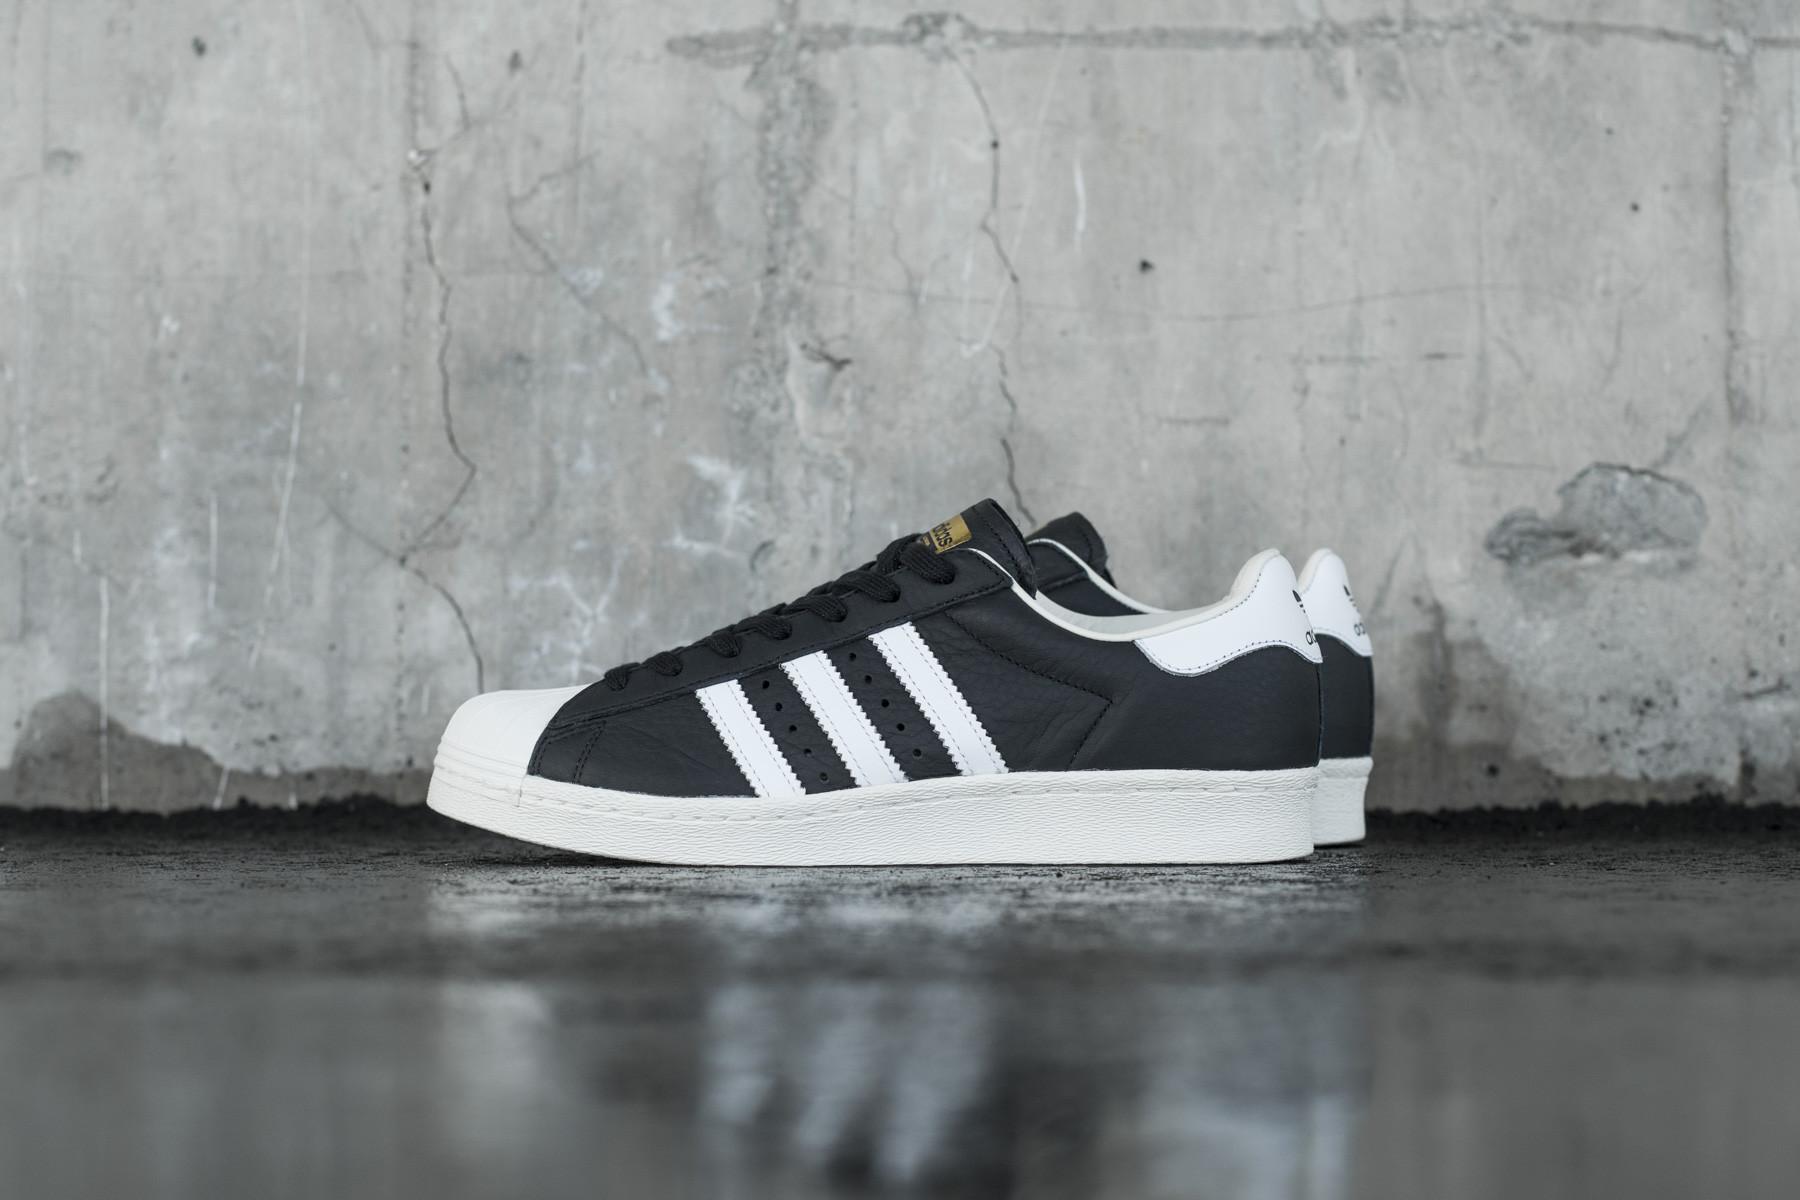 Cheap Adidas superstar 80s metal toe rose,Cheap Adidas zx flux adv verve w